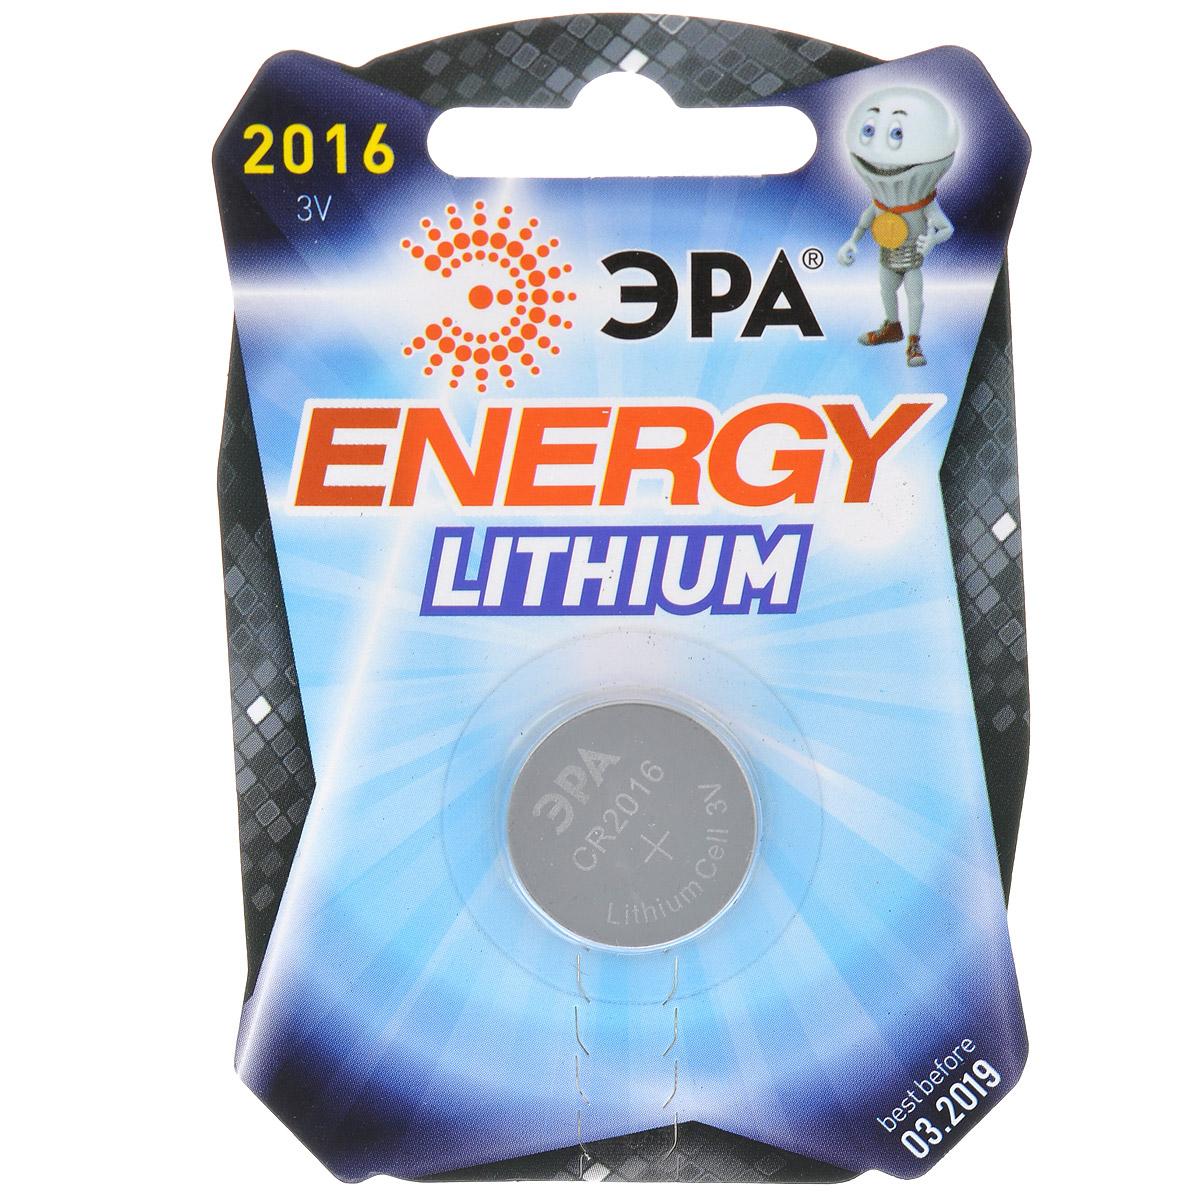 Батарейка литиевая ЭРА Energy, тип CR2016 (1BL), 3В батарейка алкалиновая эра energy тип a27 1bl 12в